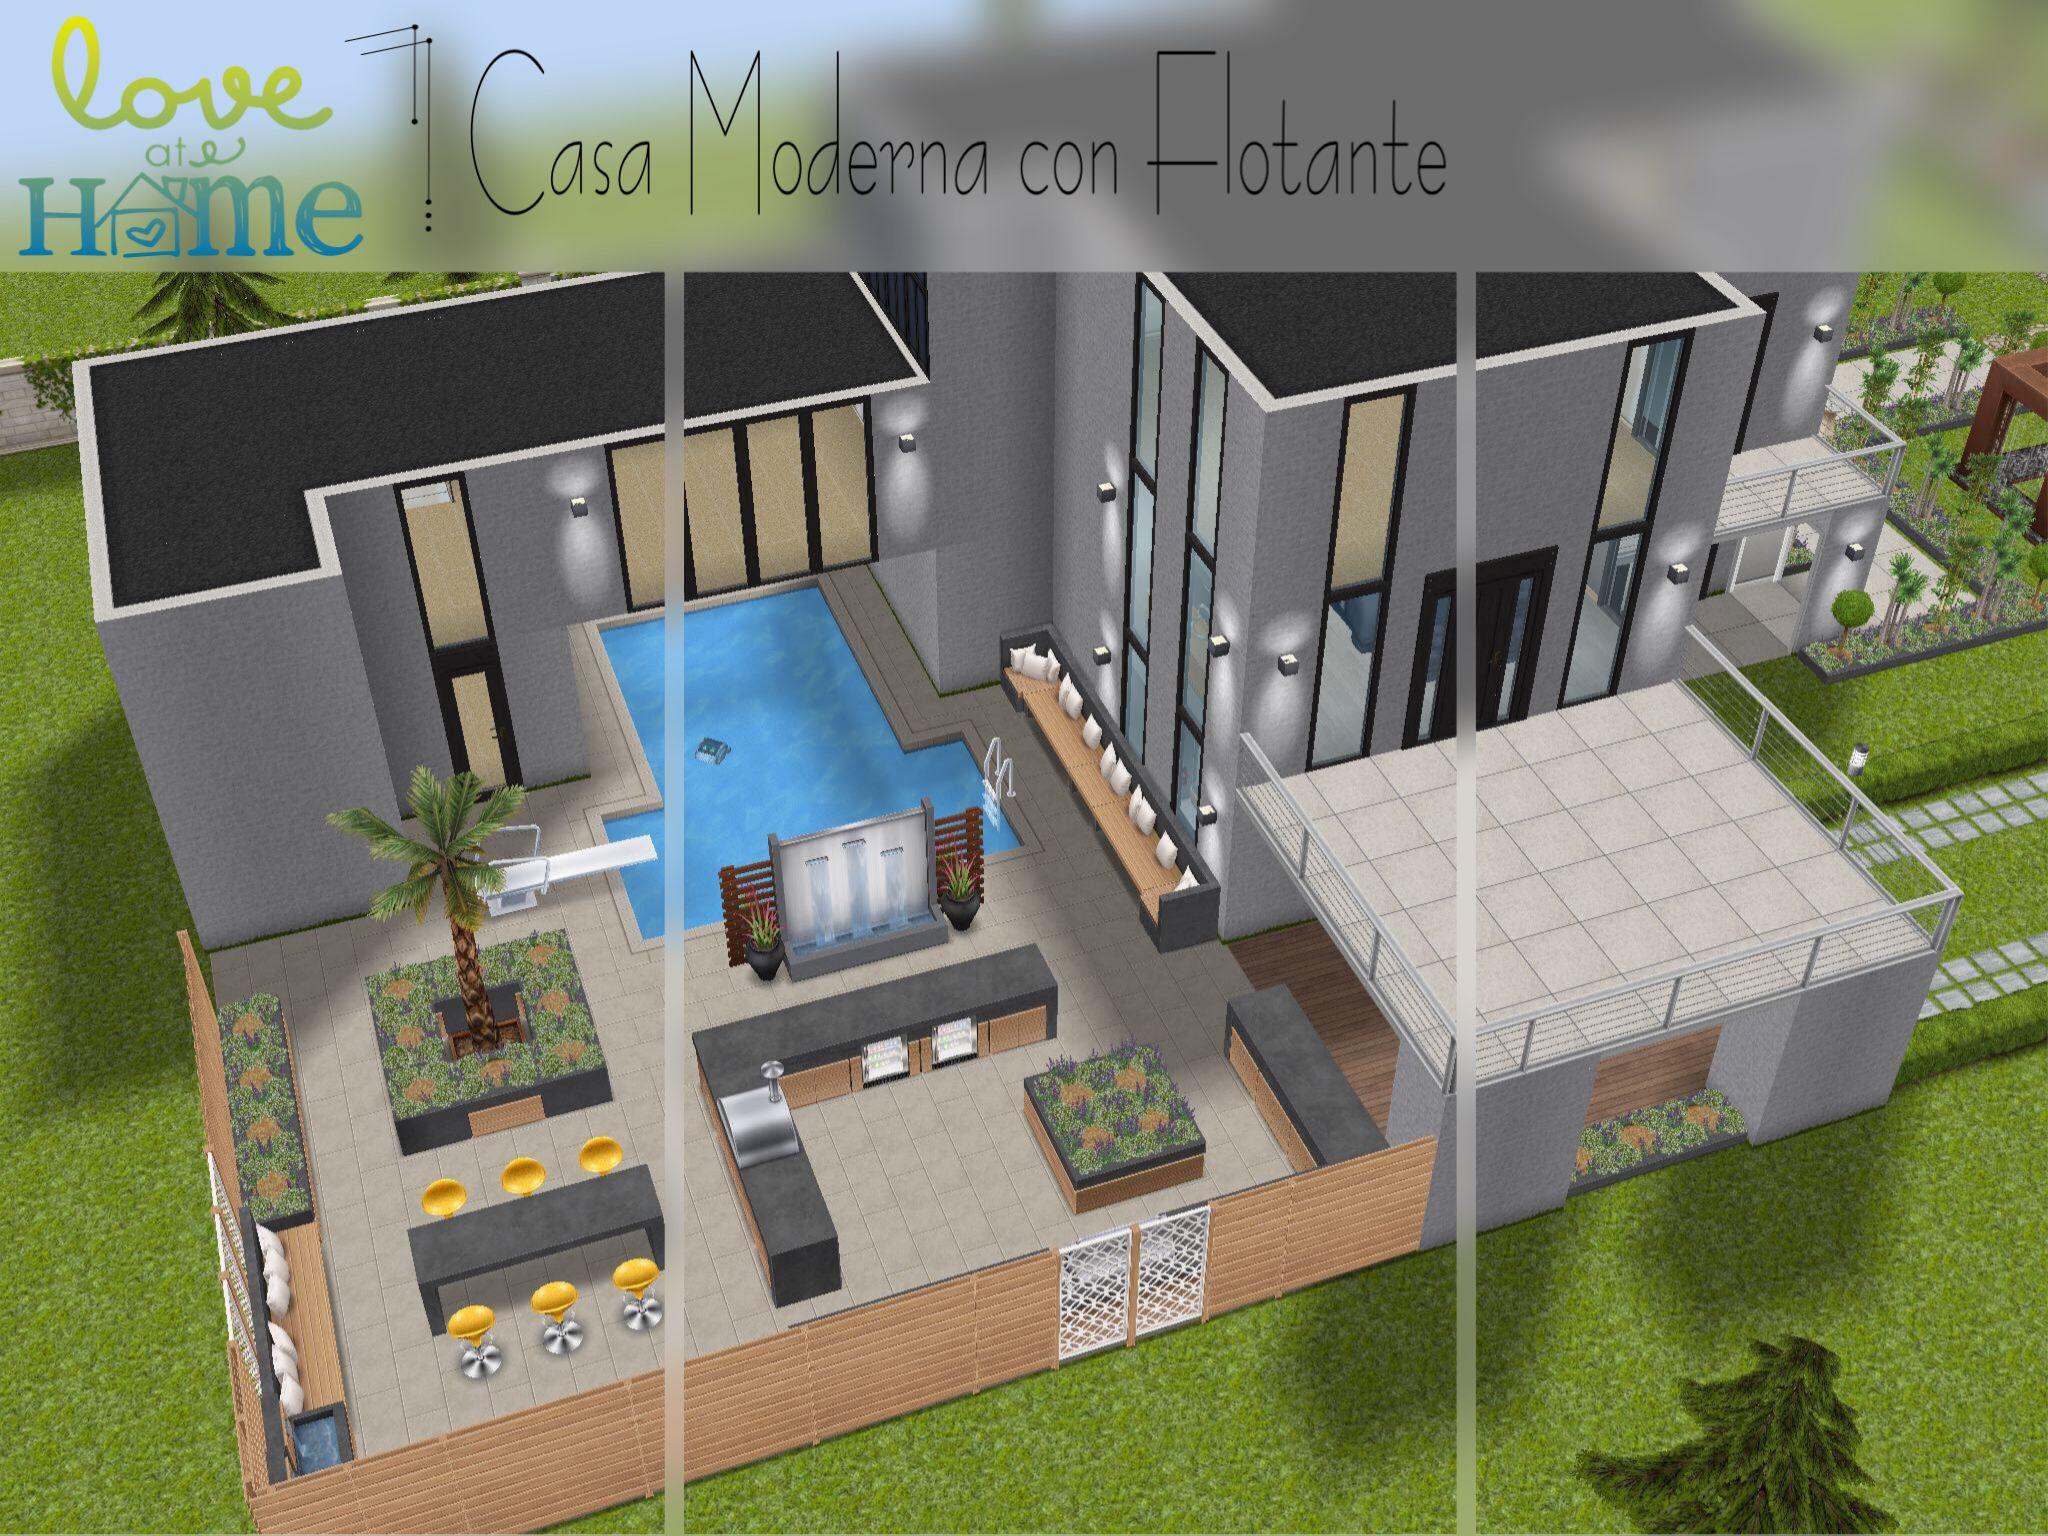 Casa en solar grande con flotante sin hack the sims for Casa moderna sims 3 sin expansiones